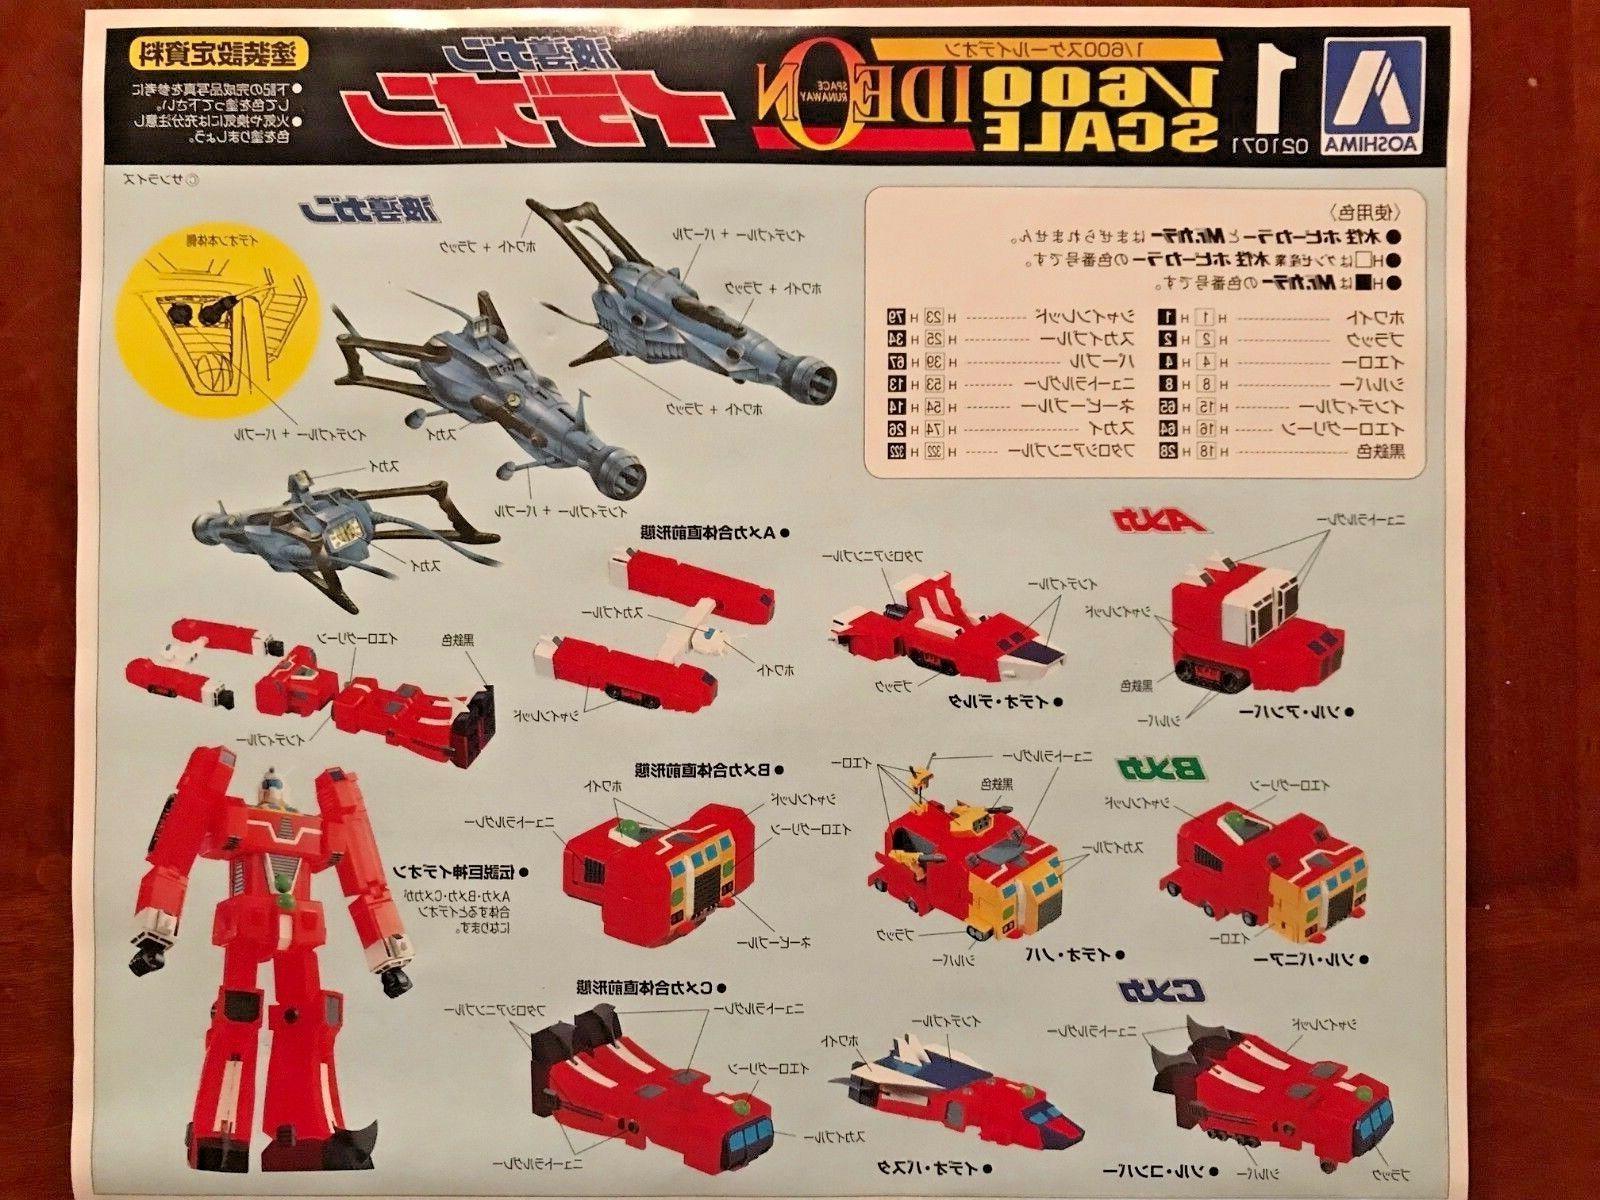 Aoshima 1 Space Runaway 1/600 Scale Plastic Model Kit